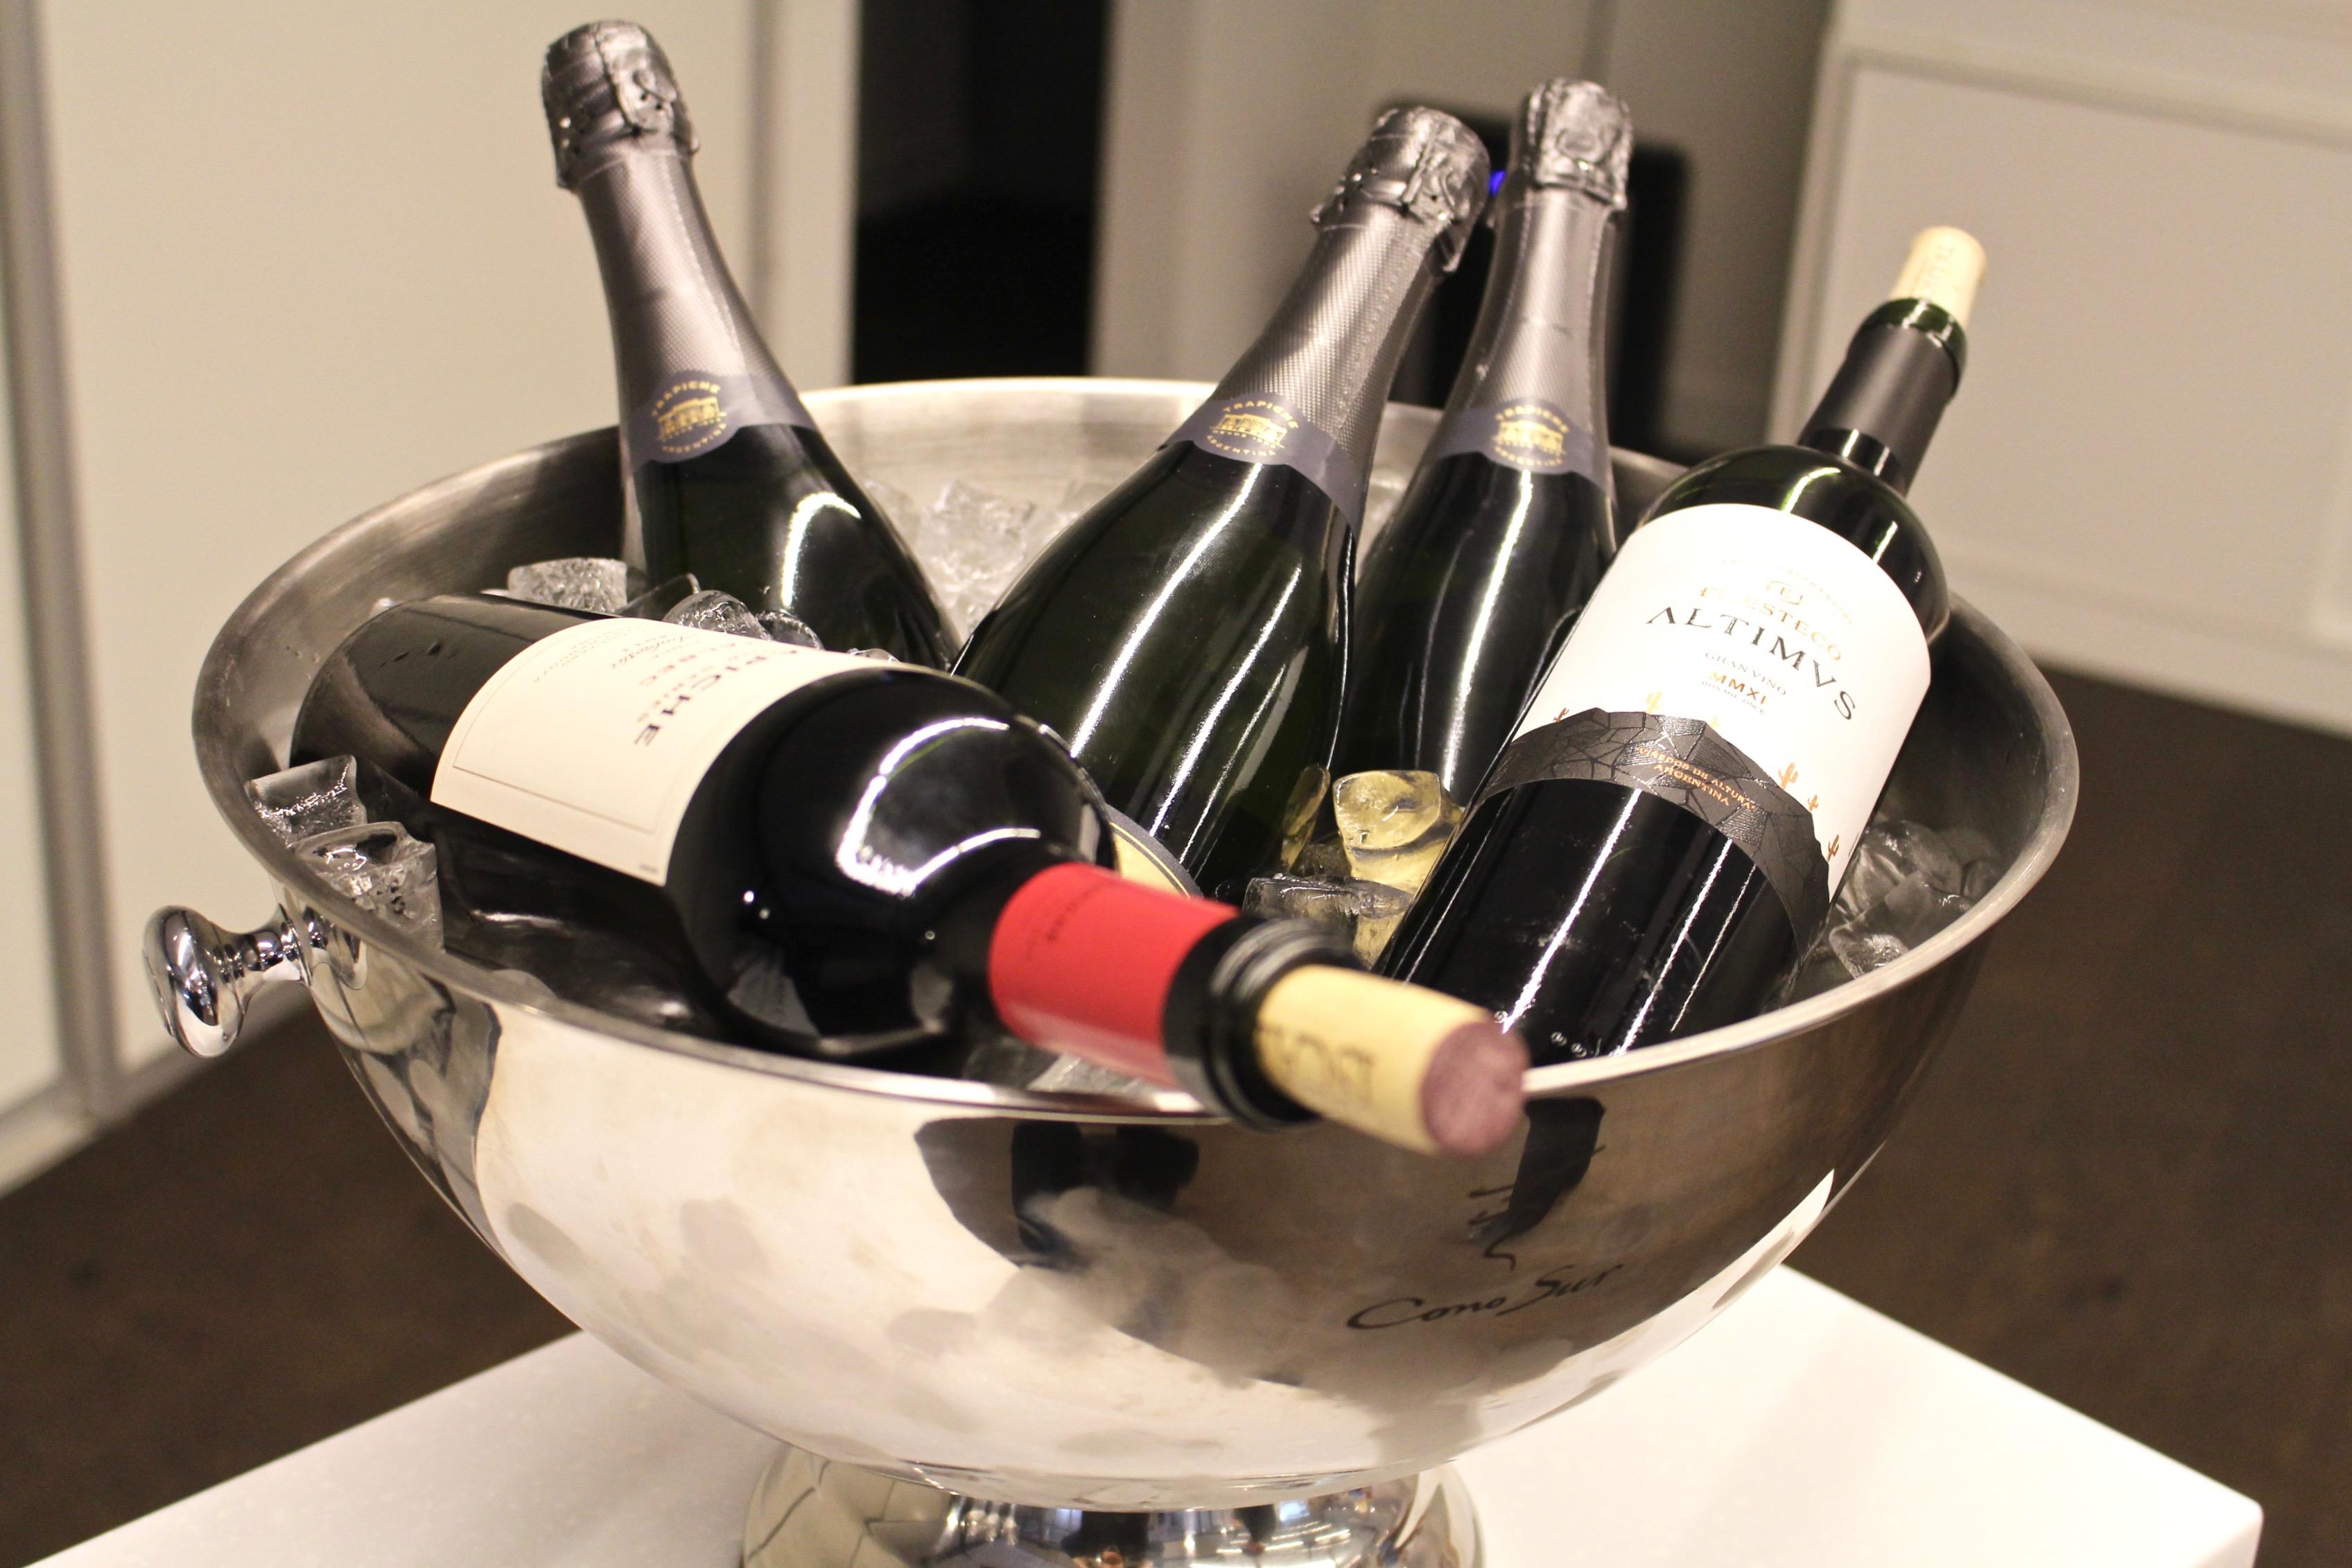 Argentinska viner vid Arvid Rosengrens prisutdelning på Restaurangakademien i Stockholm.